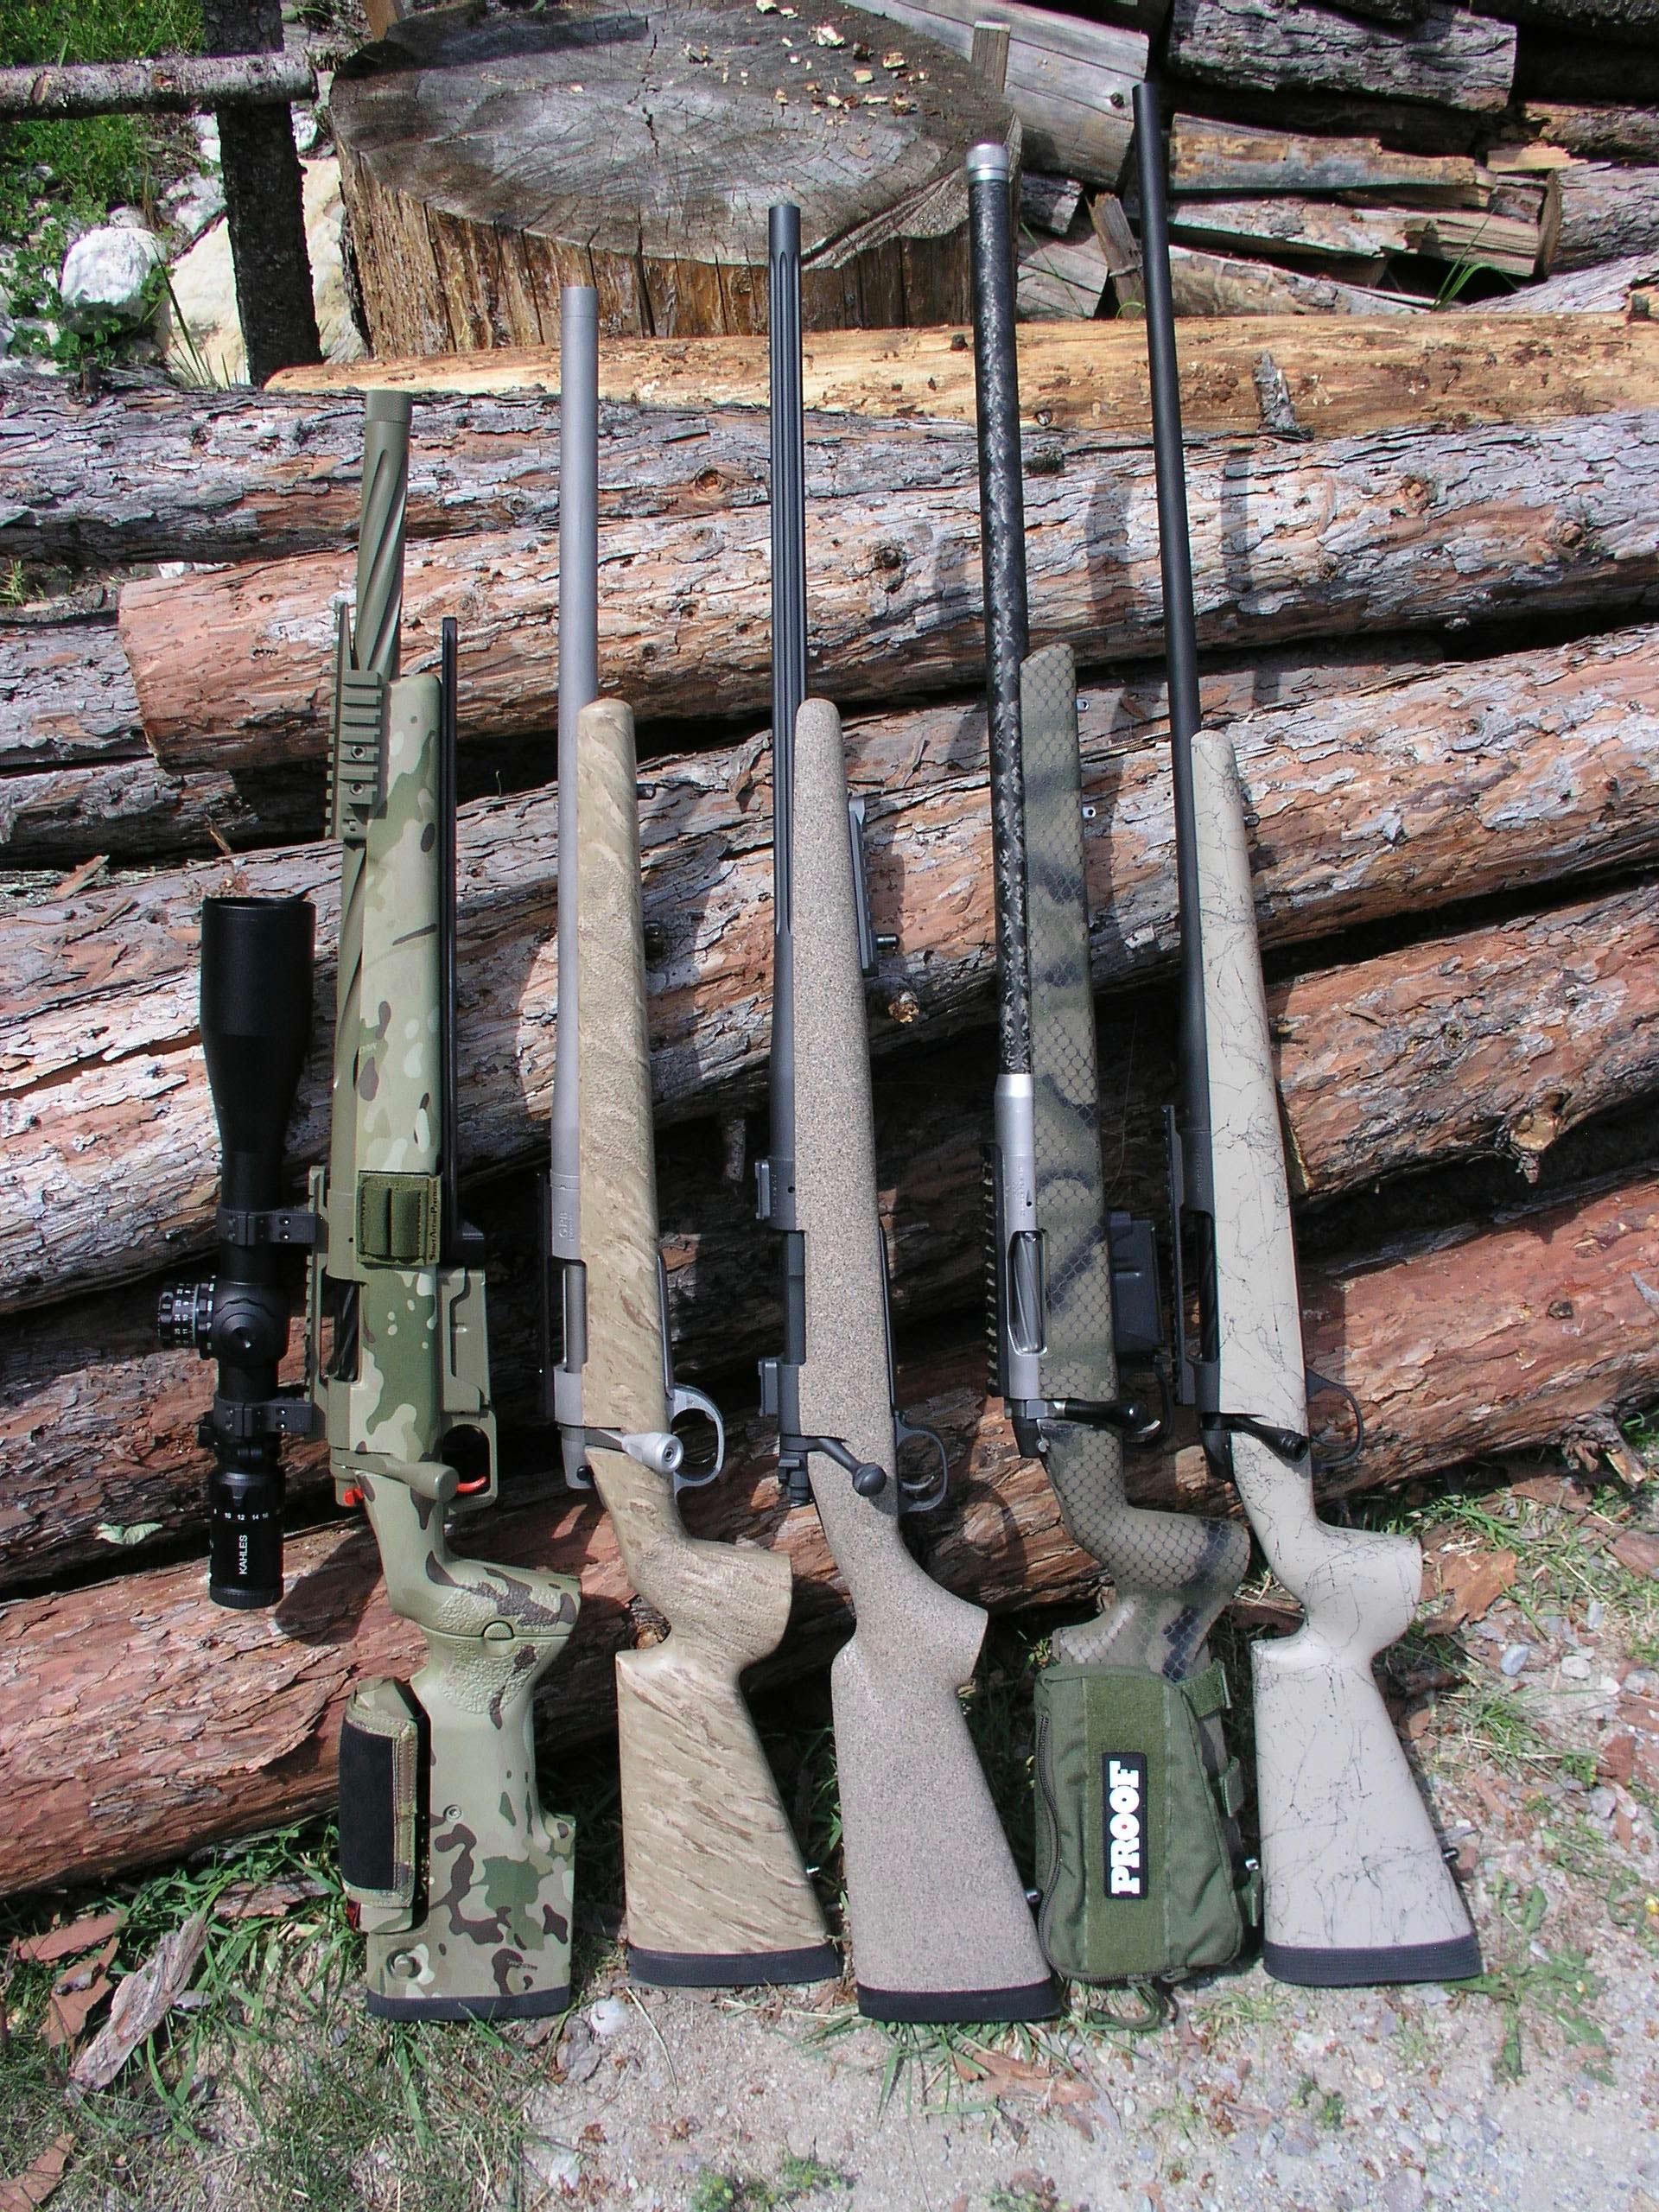 Five rifles showing different barrel lengths